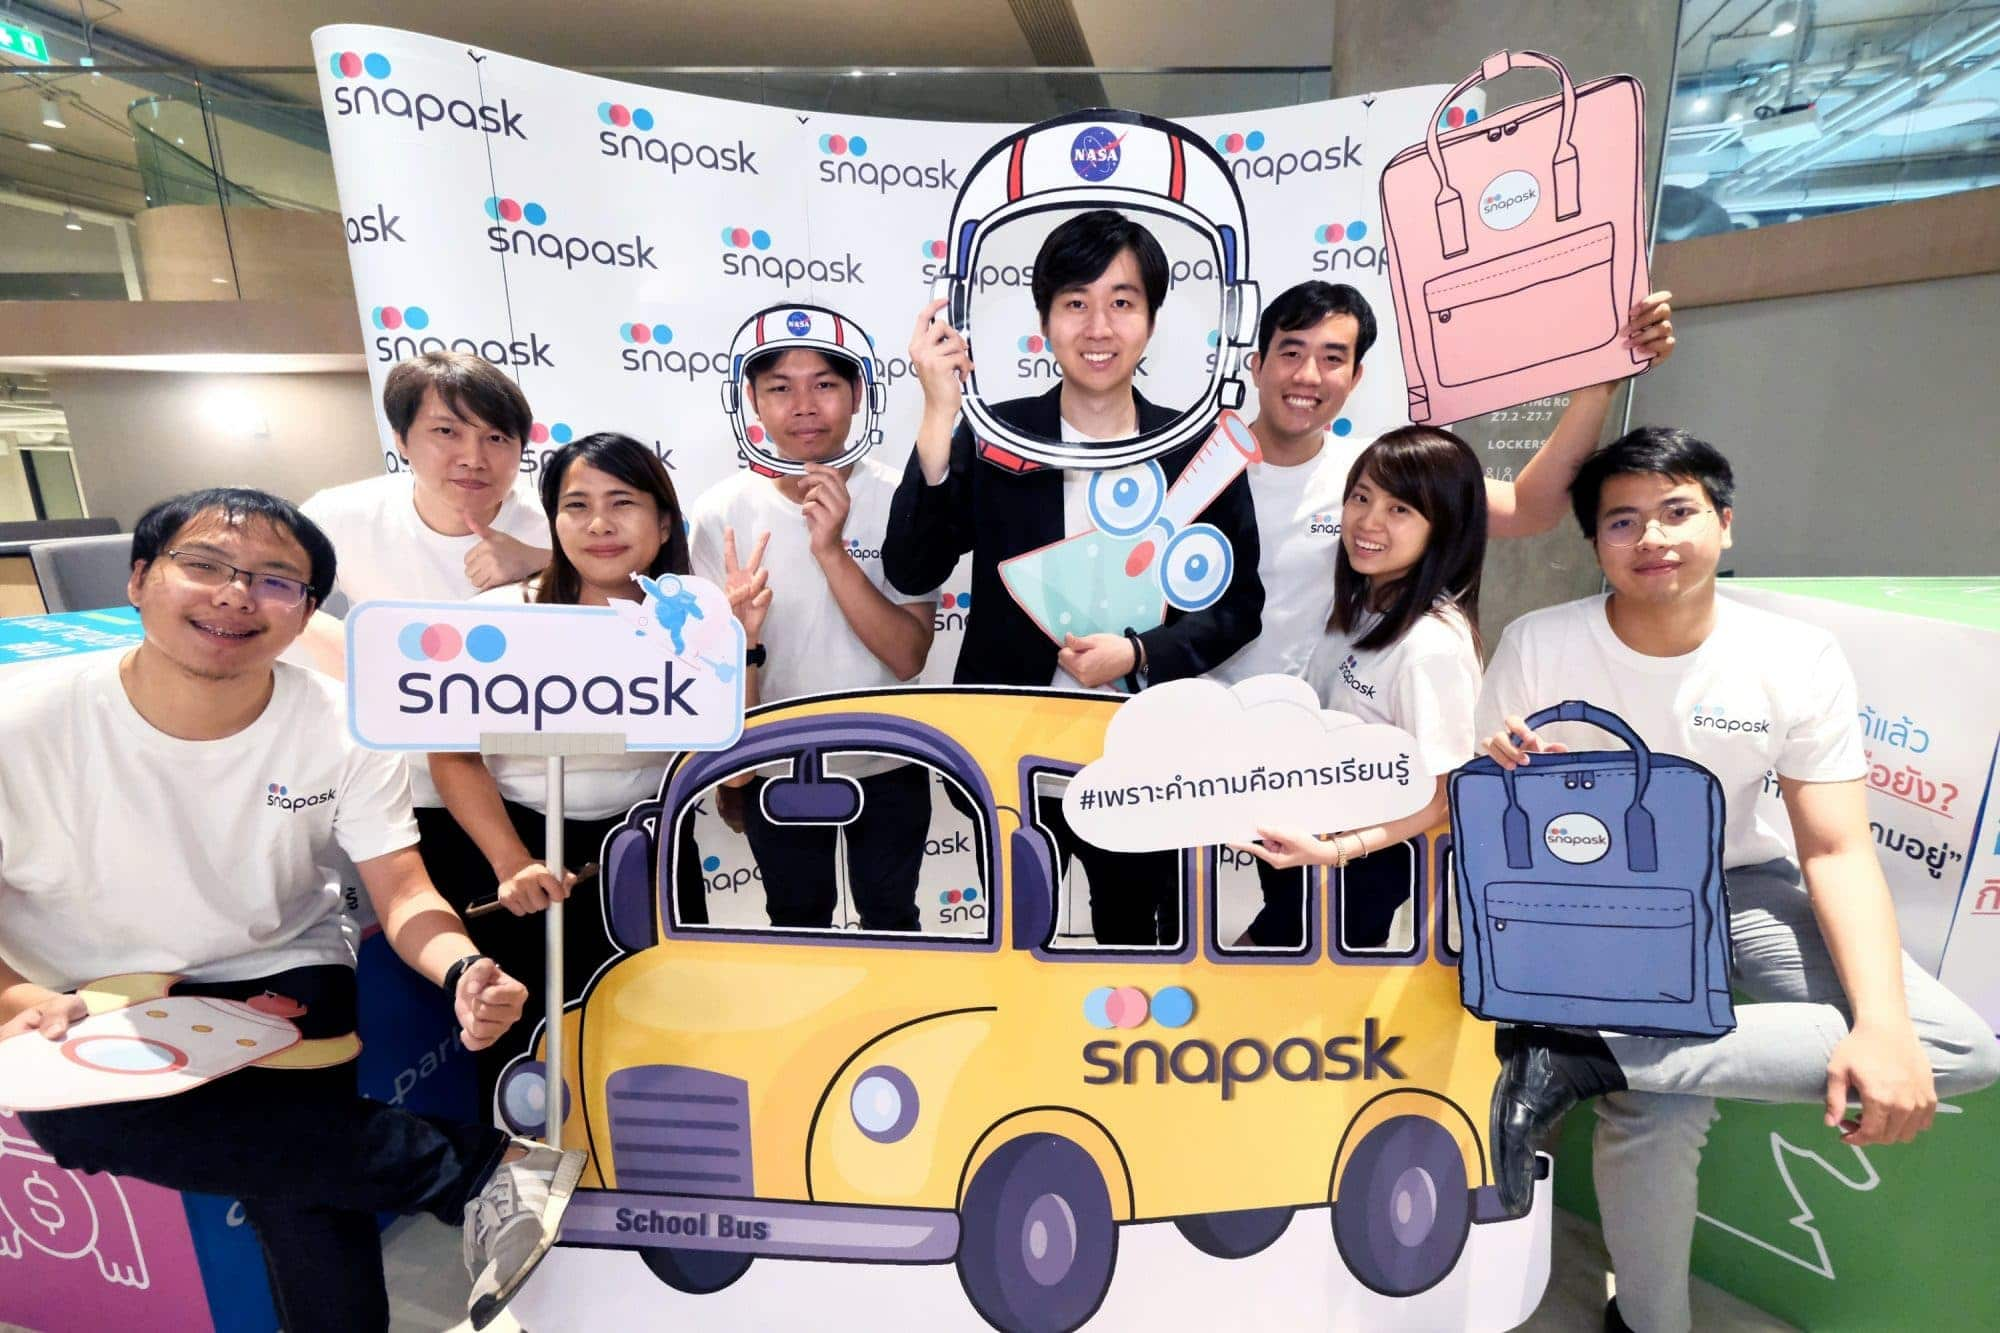 - Snapask New Gen Dream เผย 3 ฟีเจอร์ใหม่ เพื่อเด็กรักเรียน